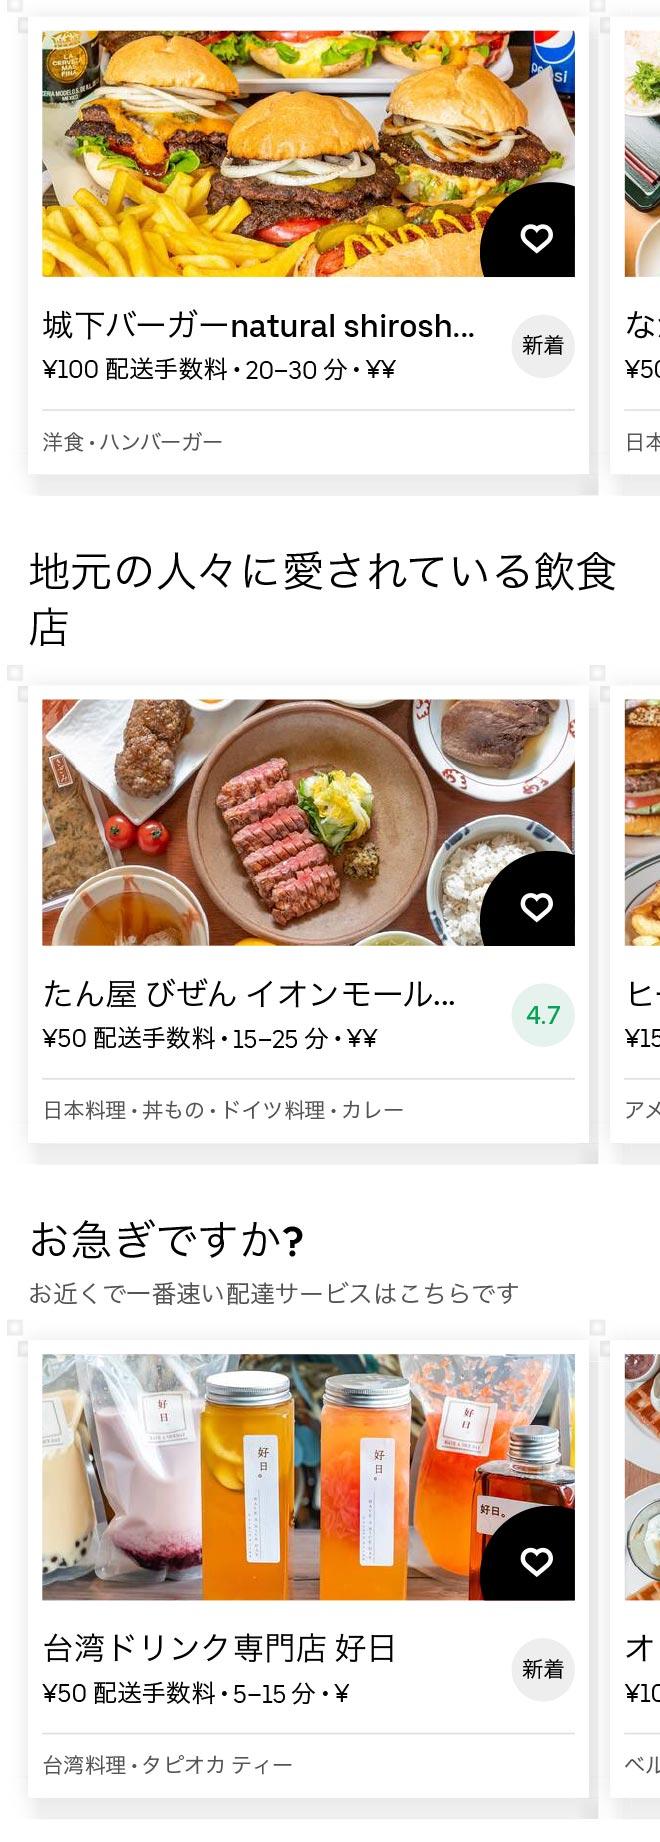 Okayama menu 2011 02